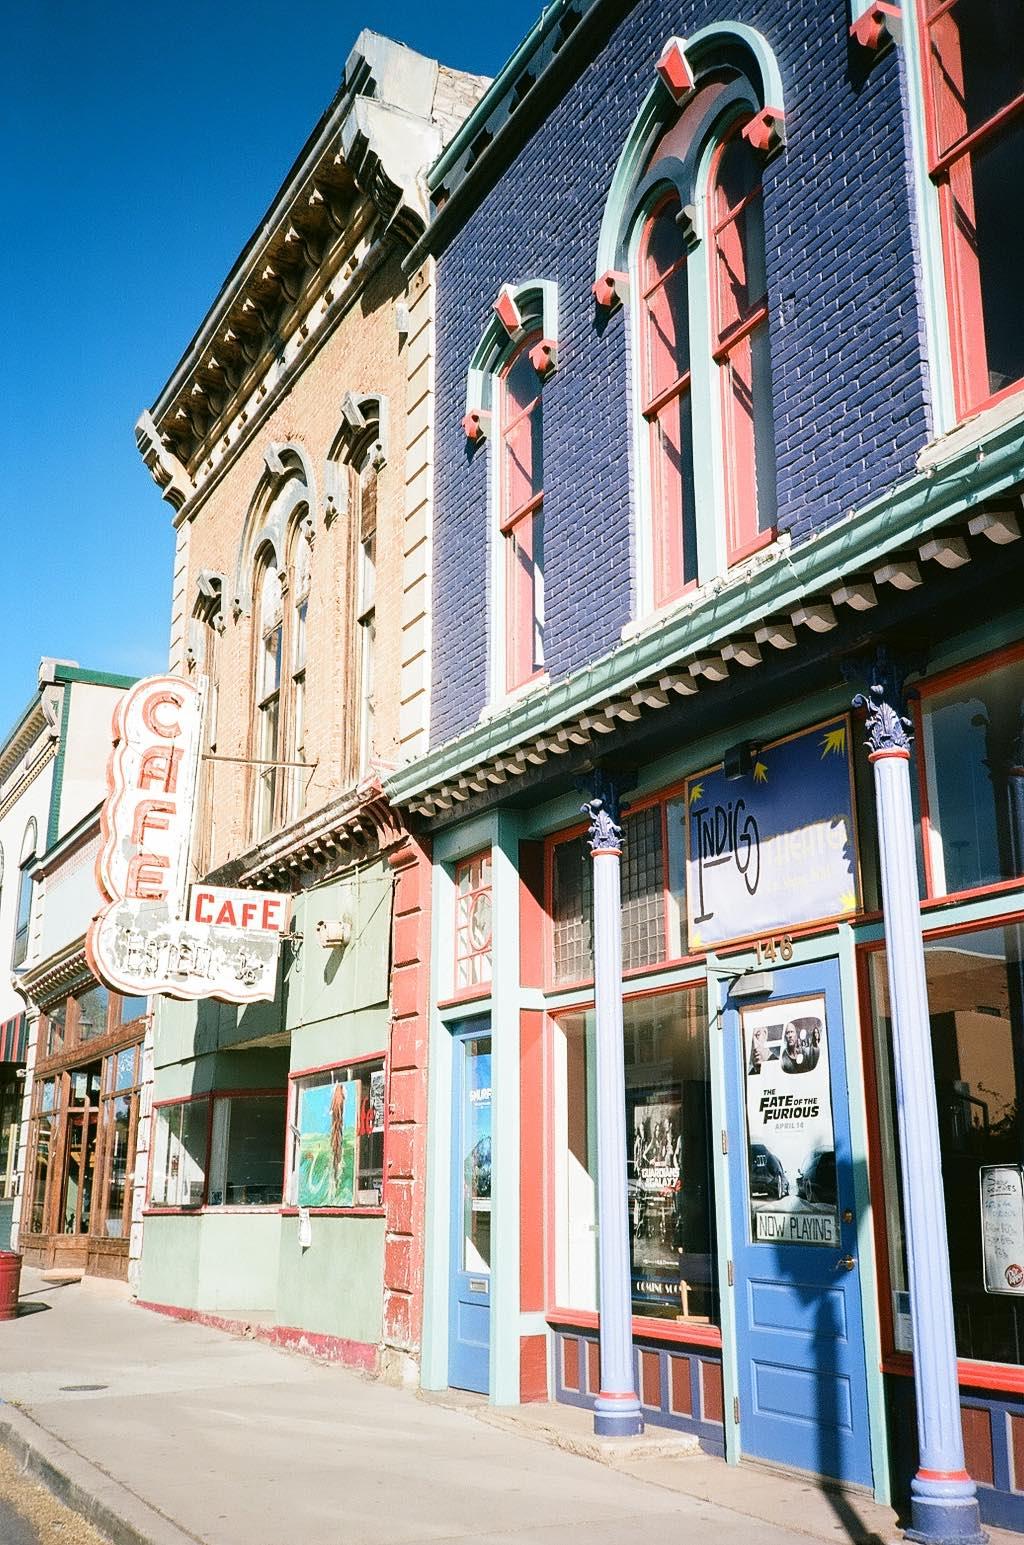 Colorful historic downtown Las Vegas, New Mexico 35mm Film Photography Nikon L35AF Kodak Ektar 100